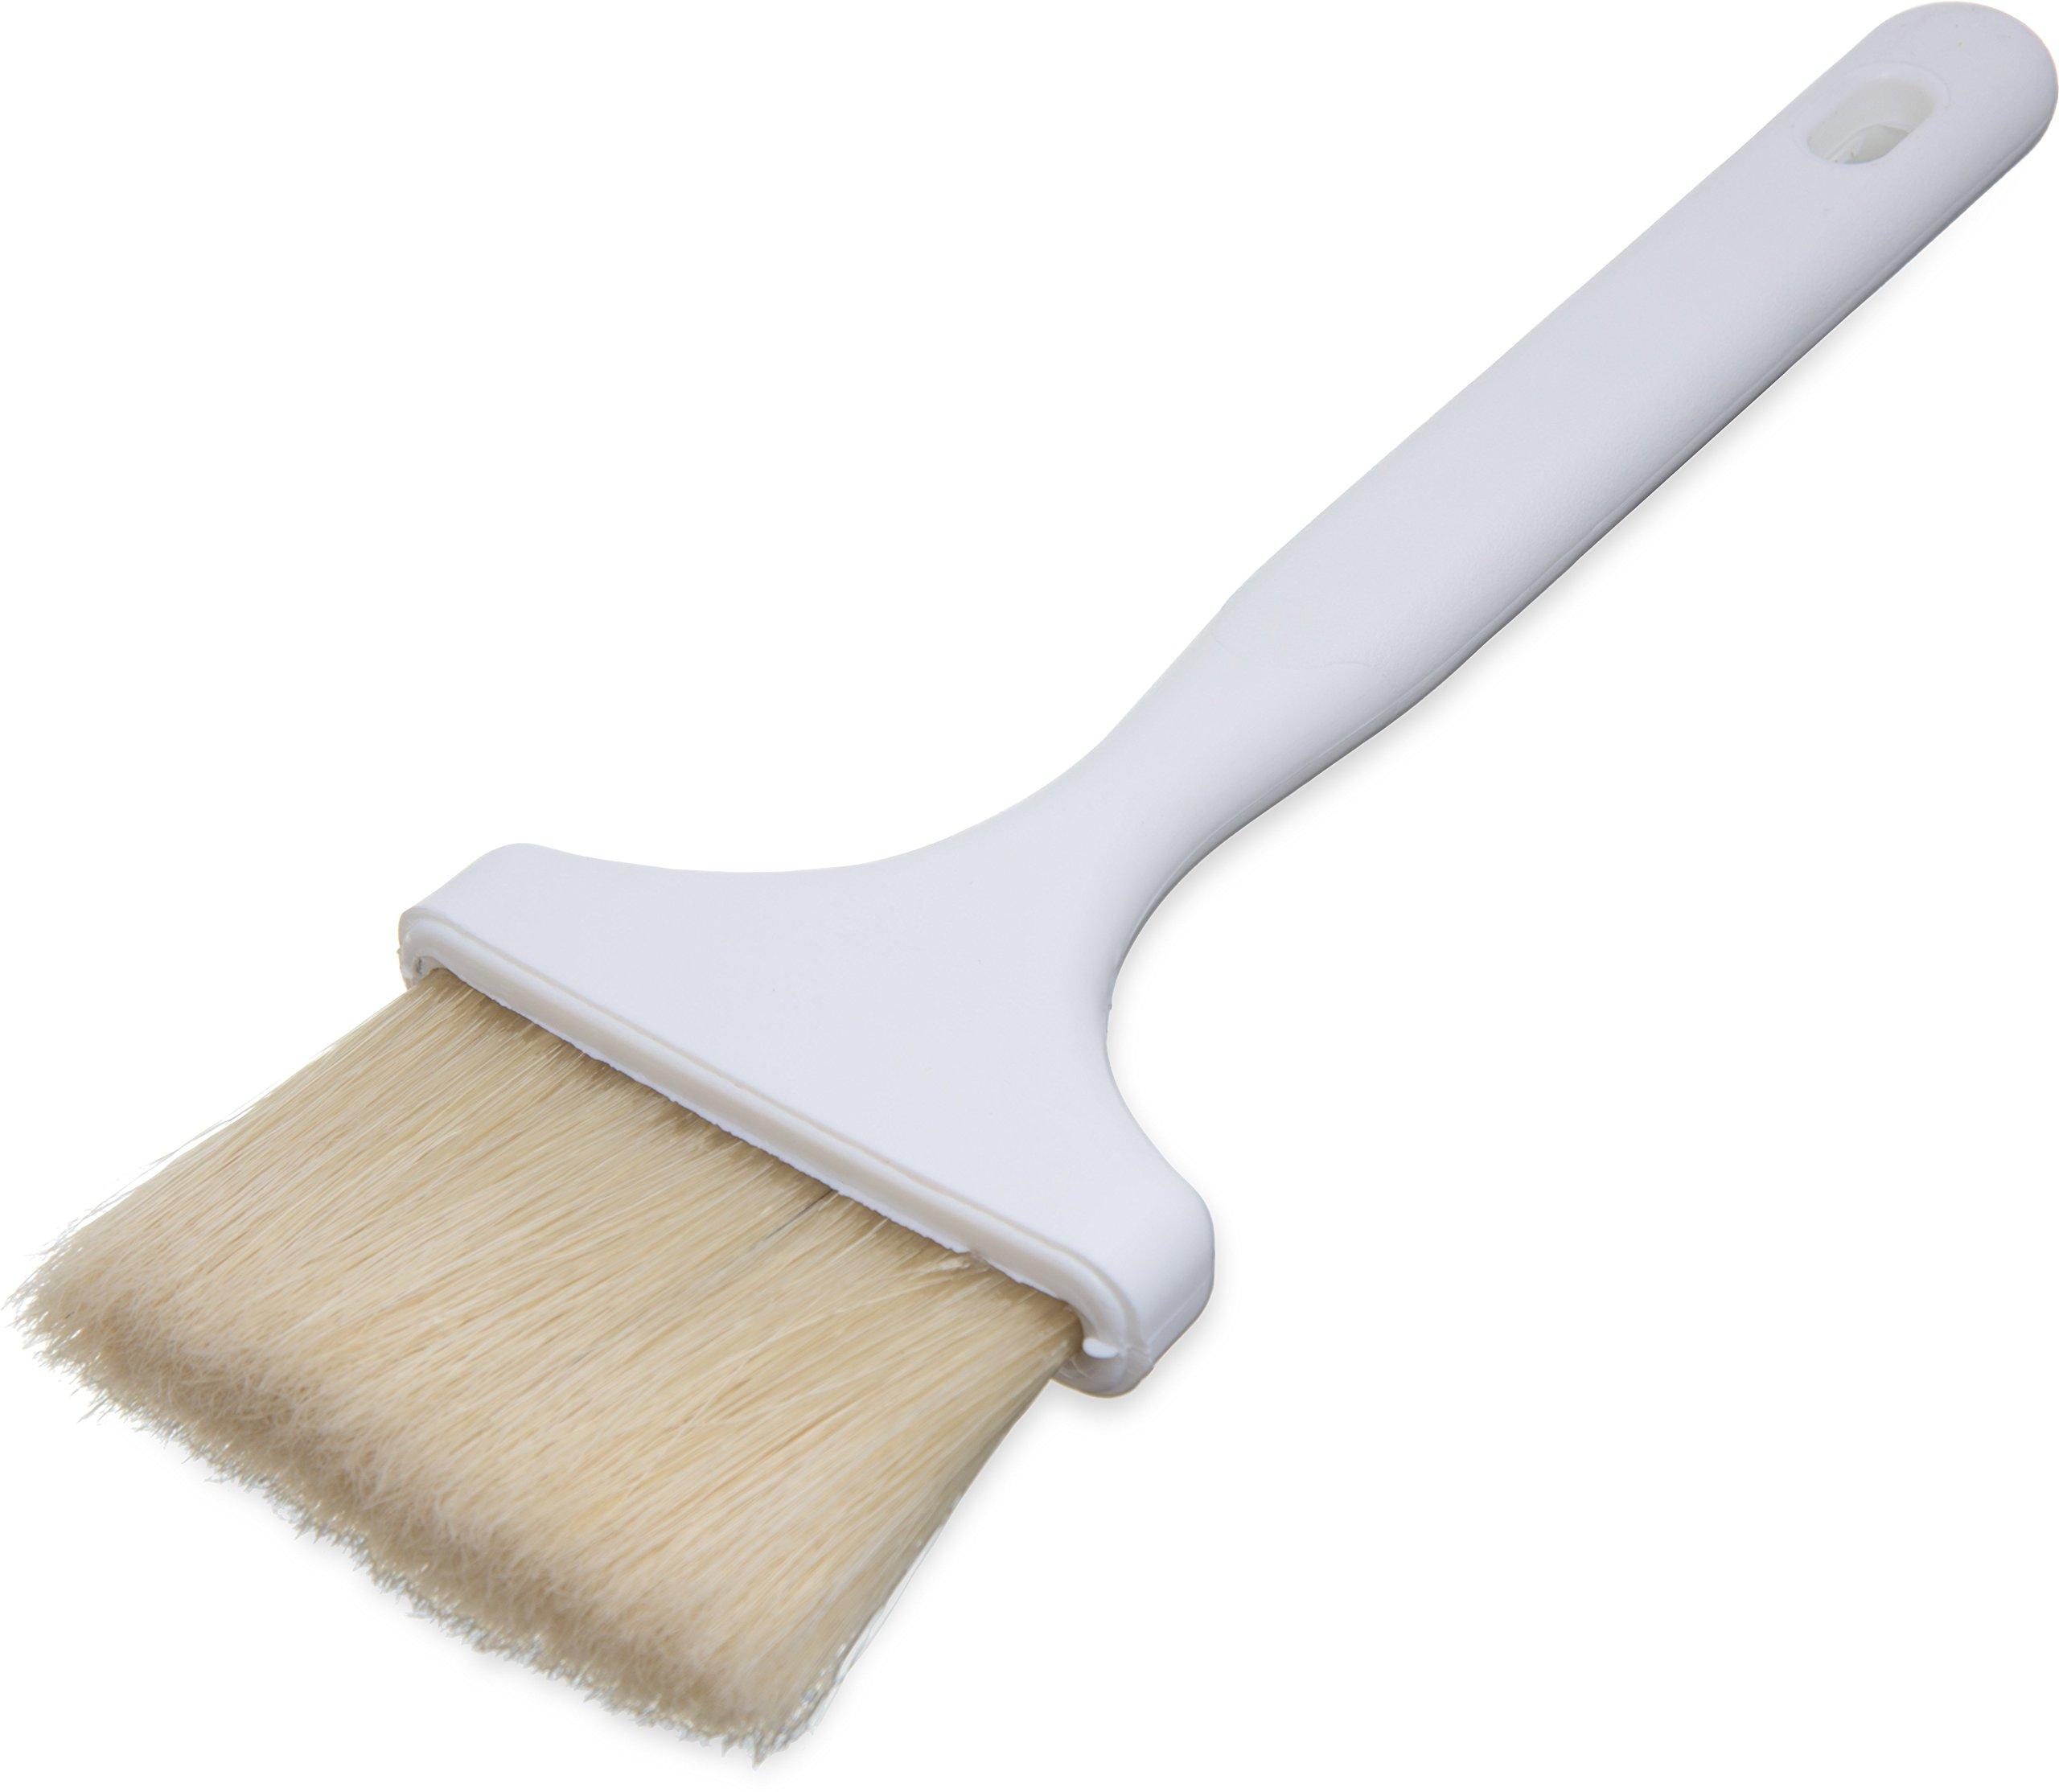 Carlisle 4037900 Sparta Meteor Pastry/Basting Brush, 3'', Boars Hair